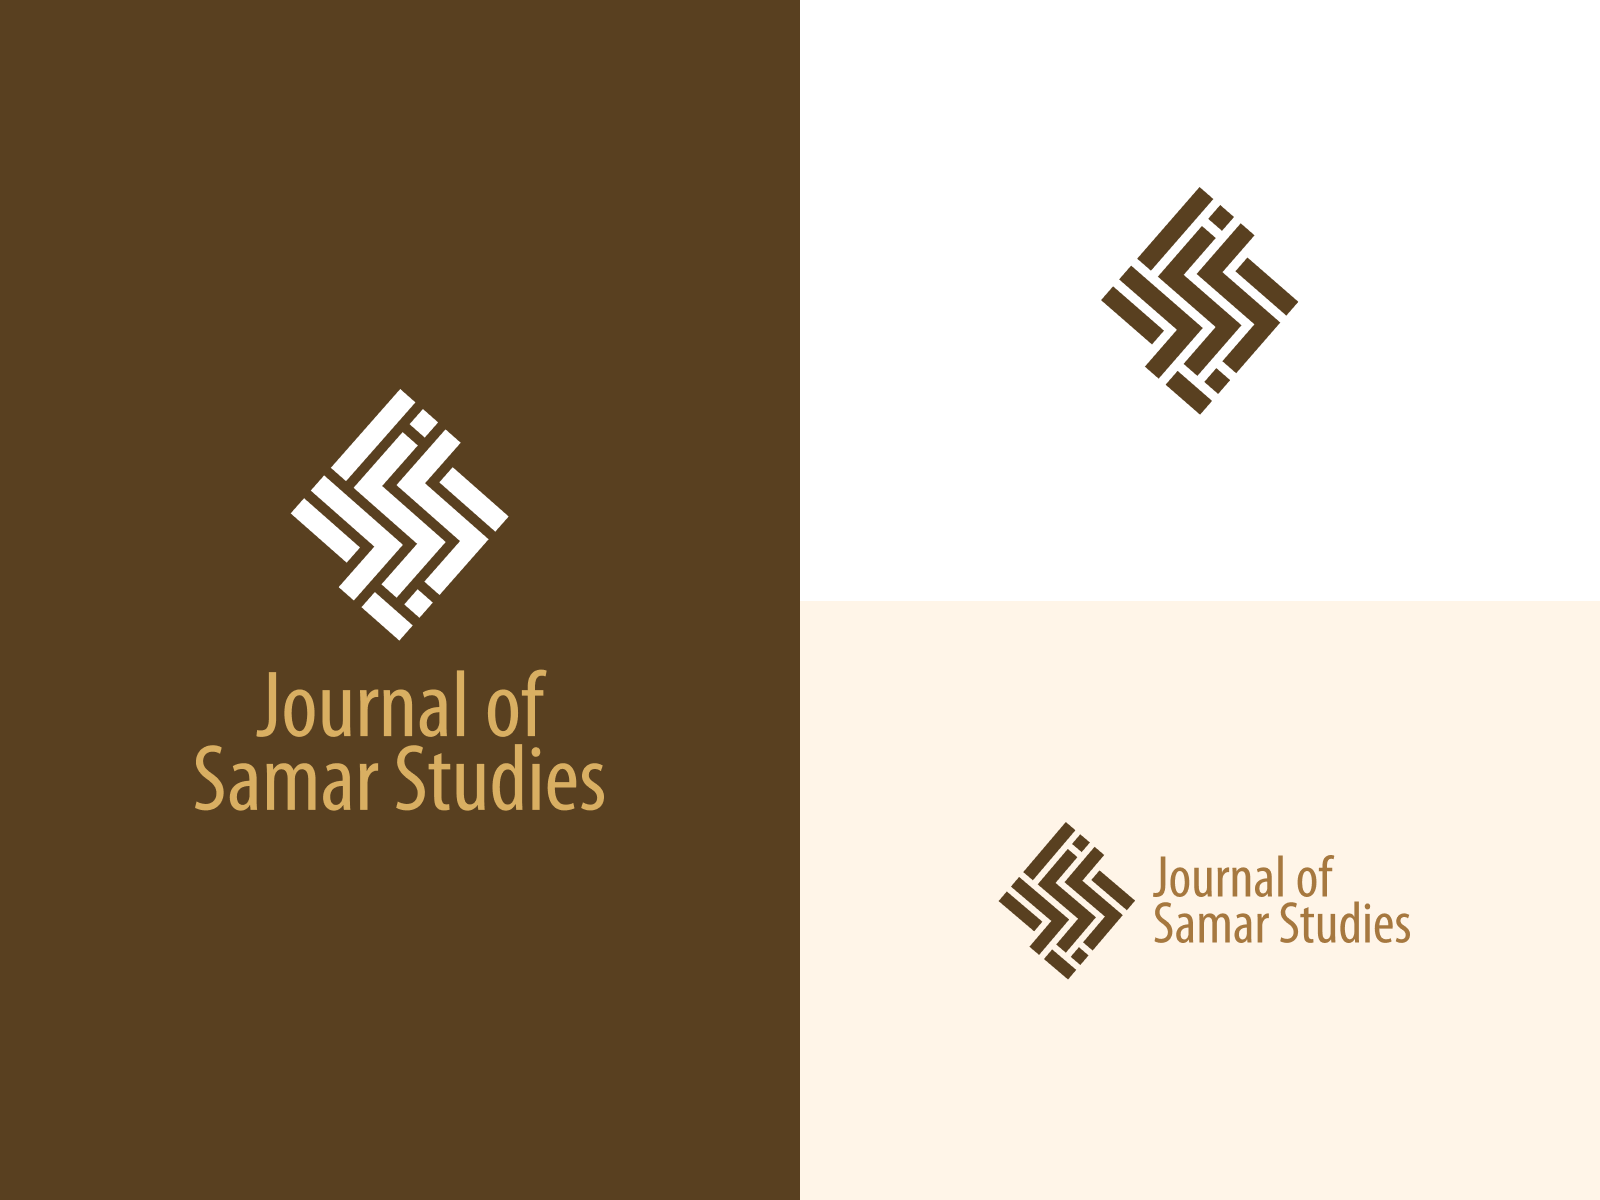 Journal of Samar Studies 2